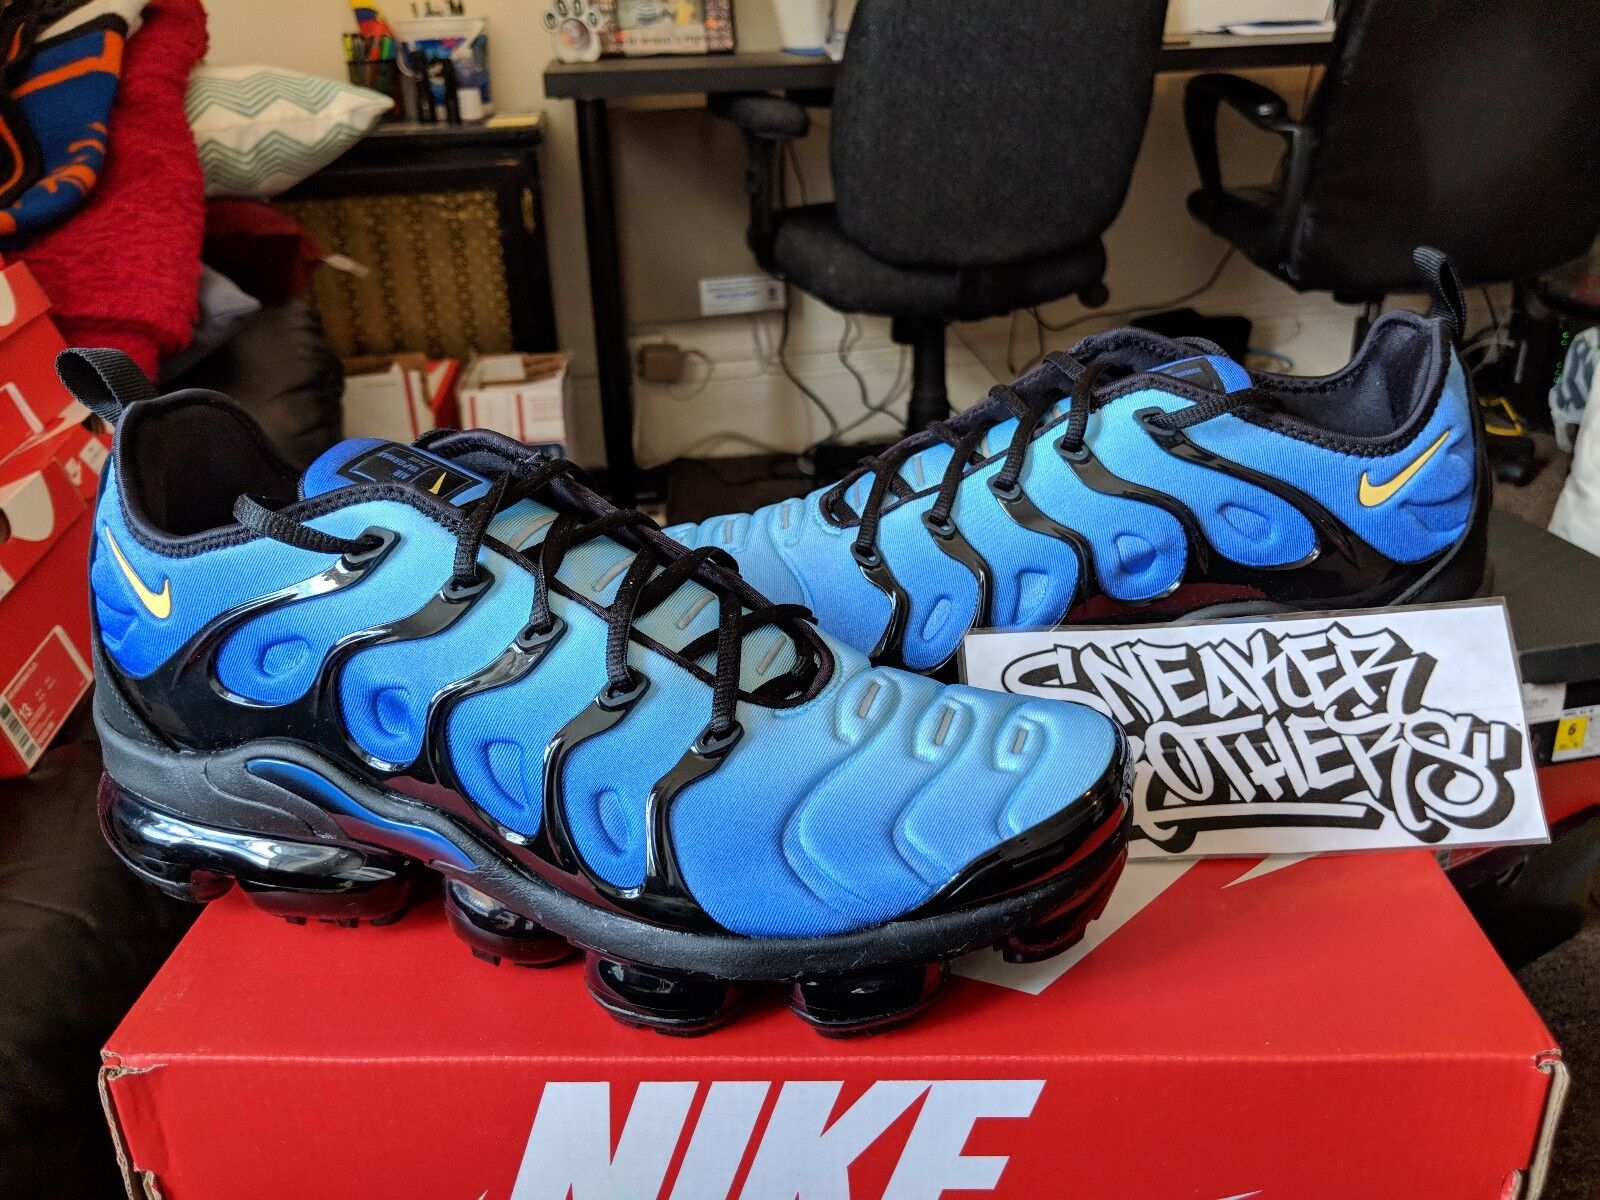 Nike Air Vapormax Plus Hyper Blue Black Yellow Reflective Men Running 924453-008